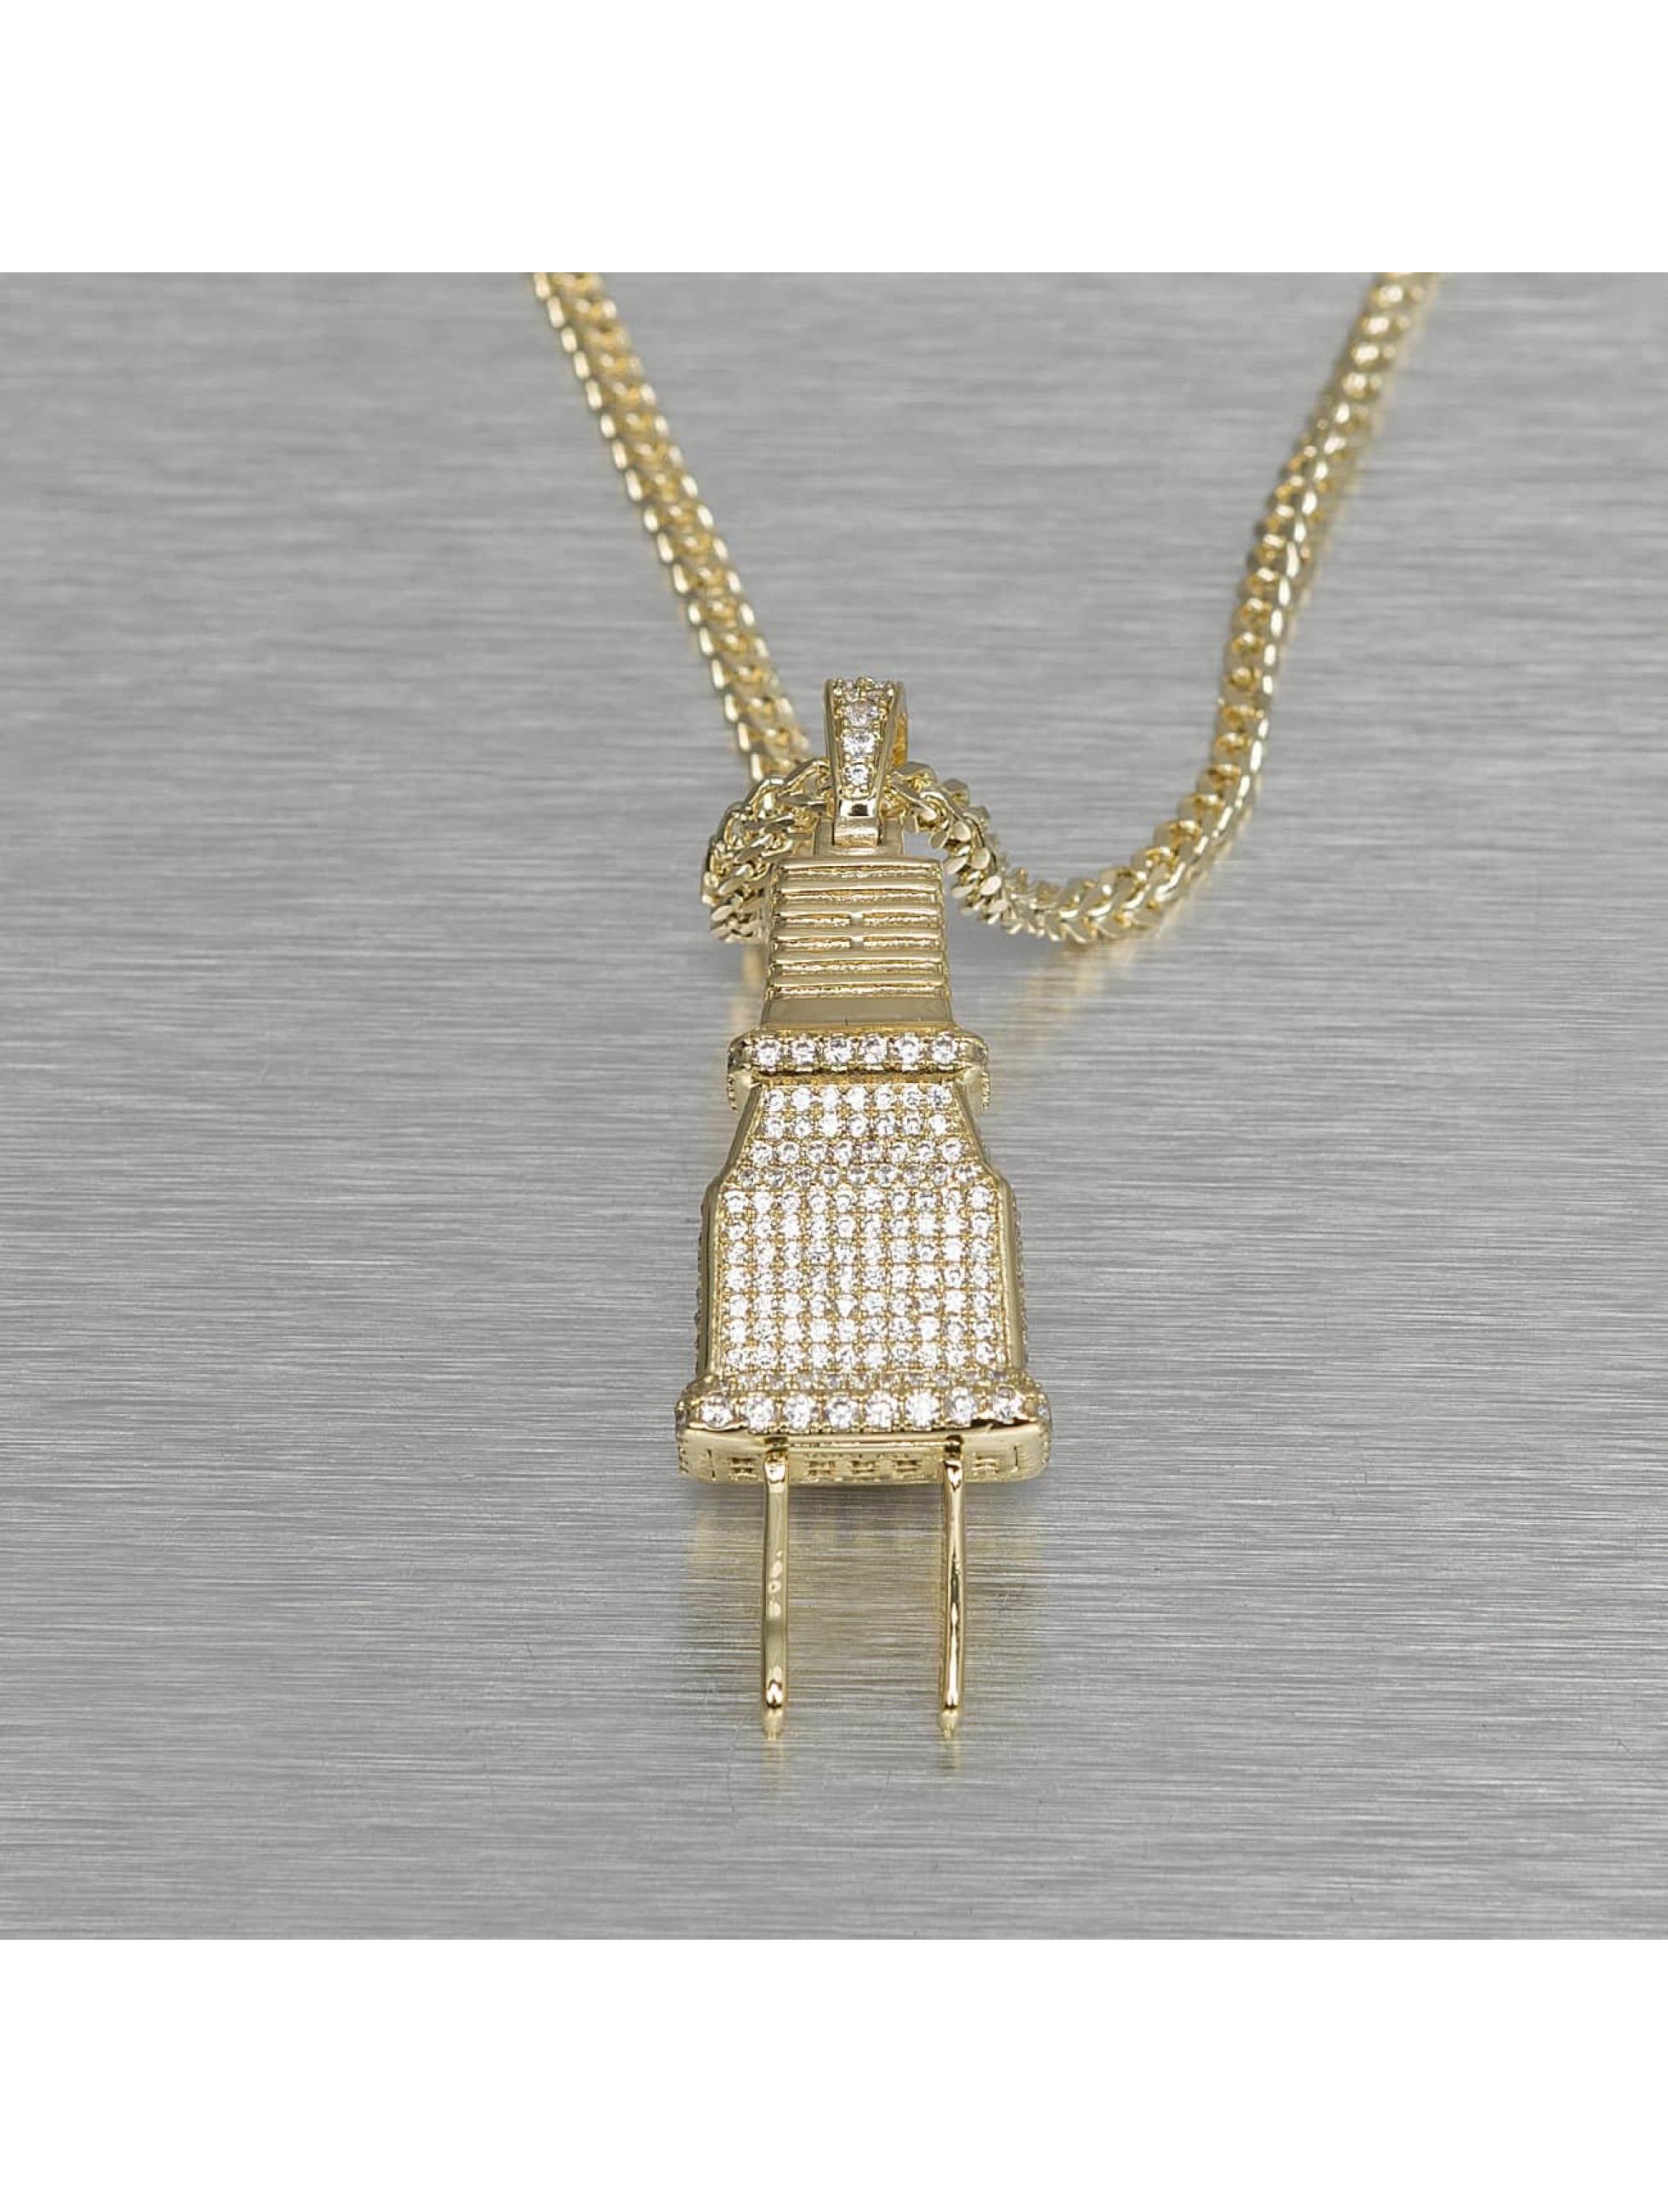 KING ICE Necklace Plug gold